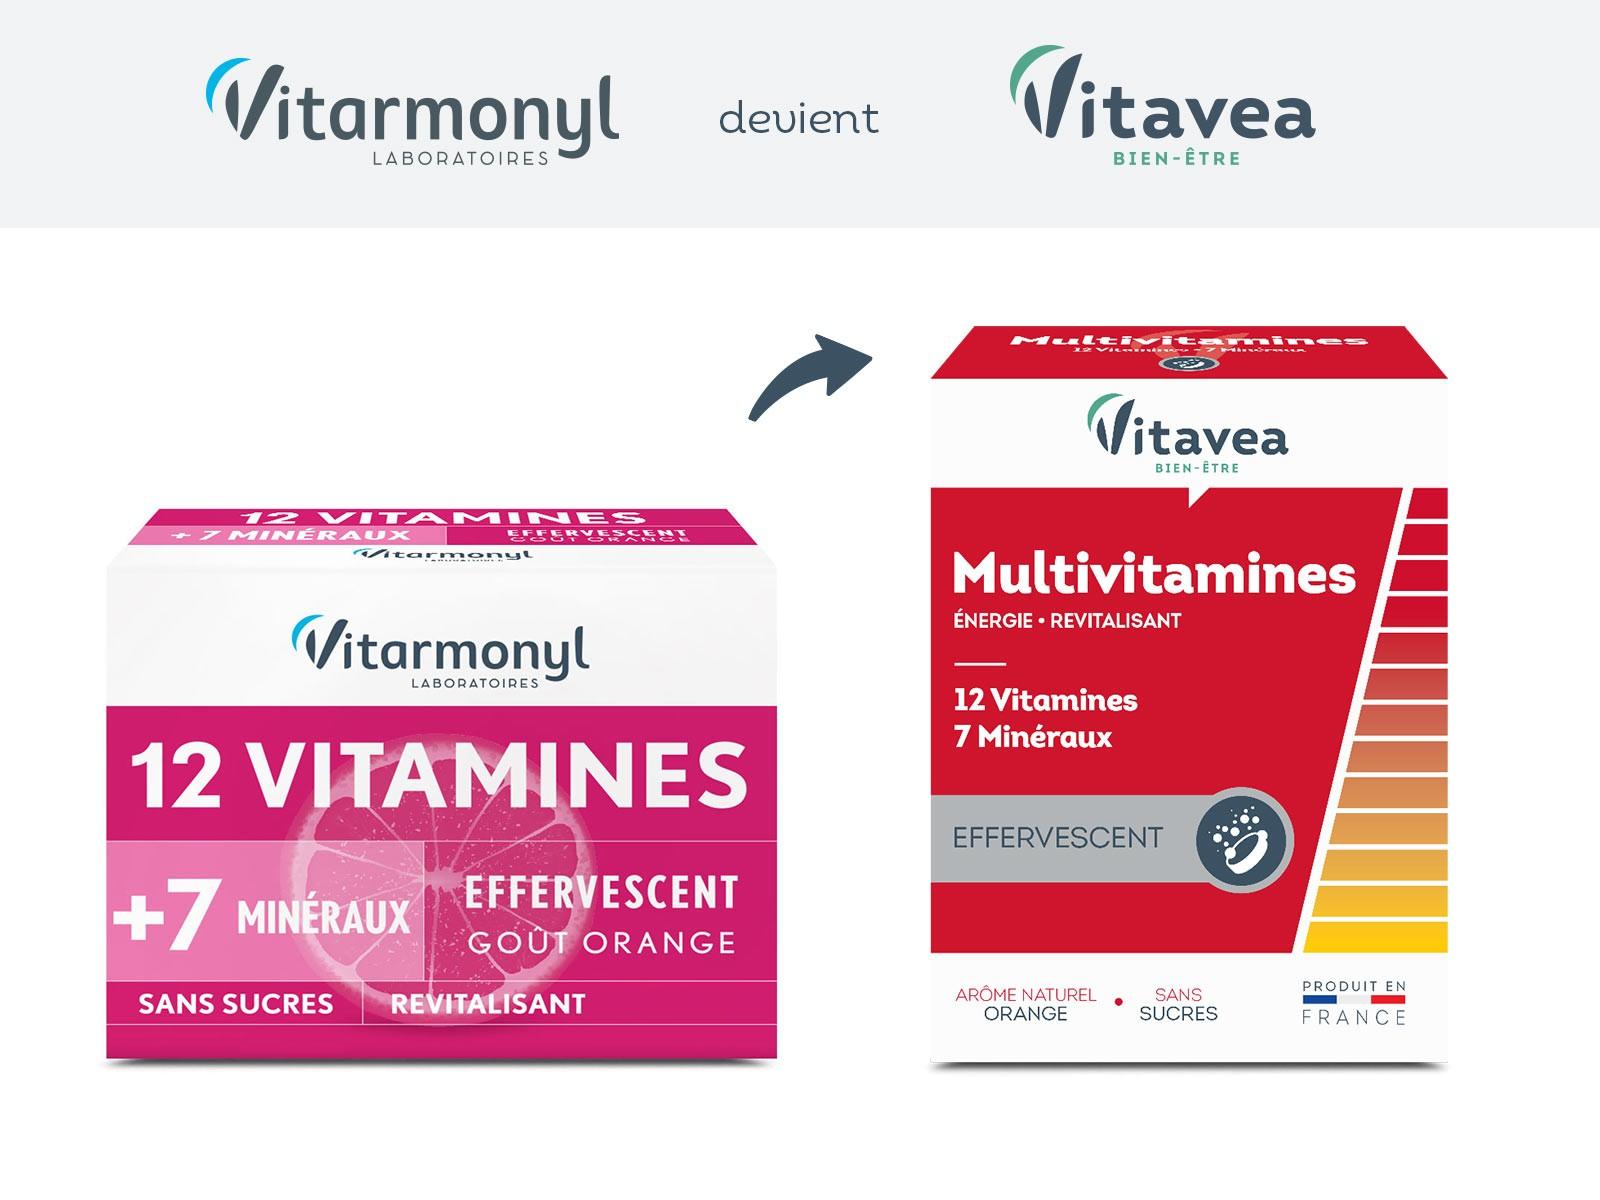 Image 12 vitamines + 7 Oligo-éléments